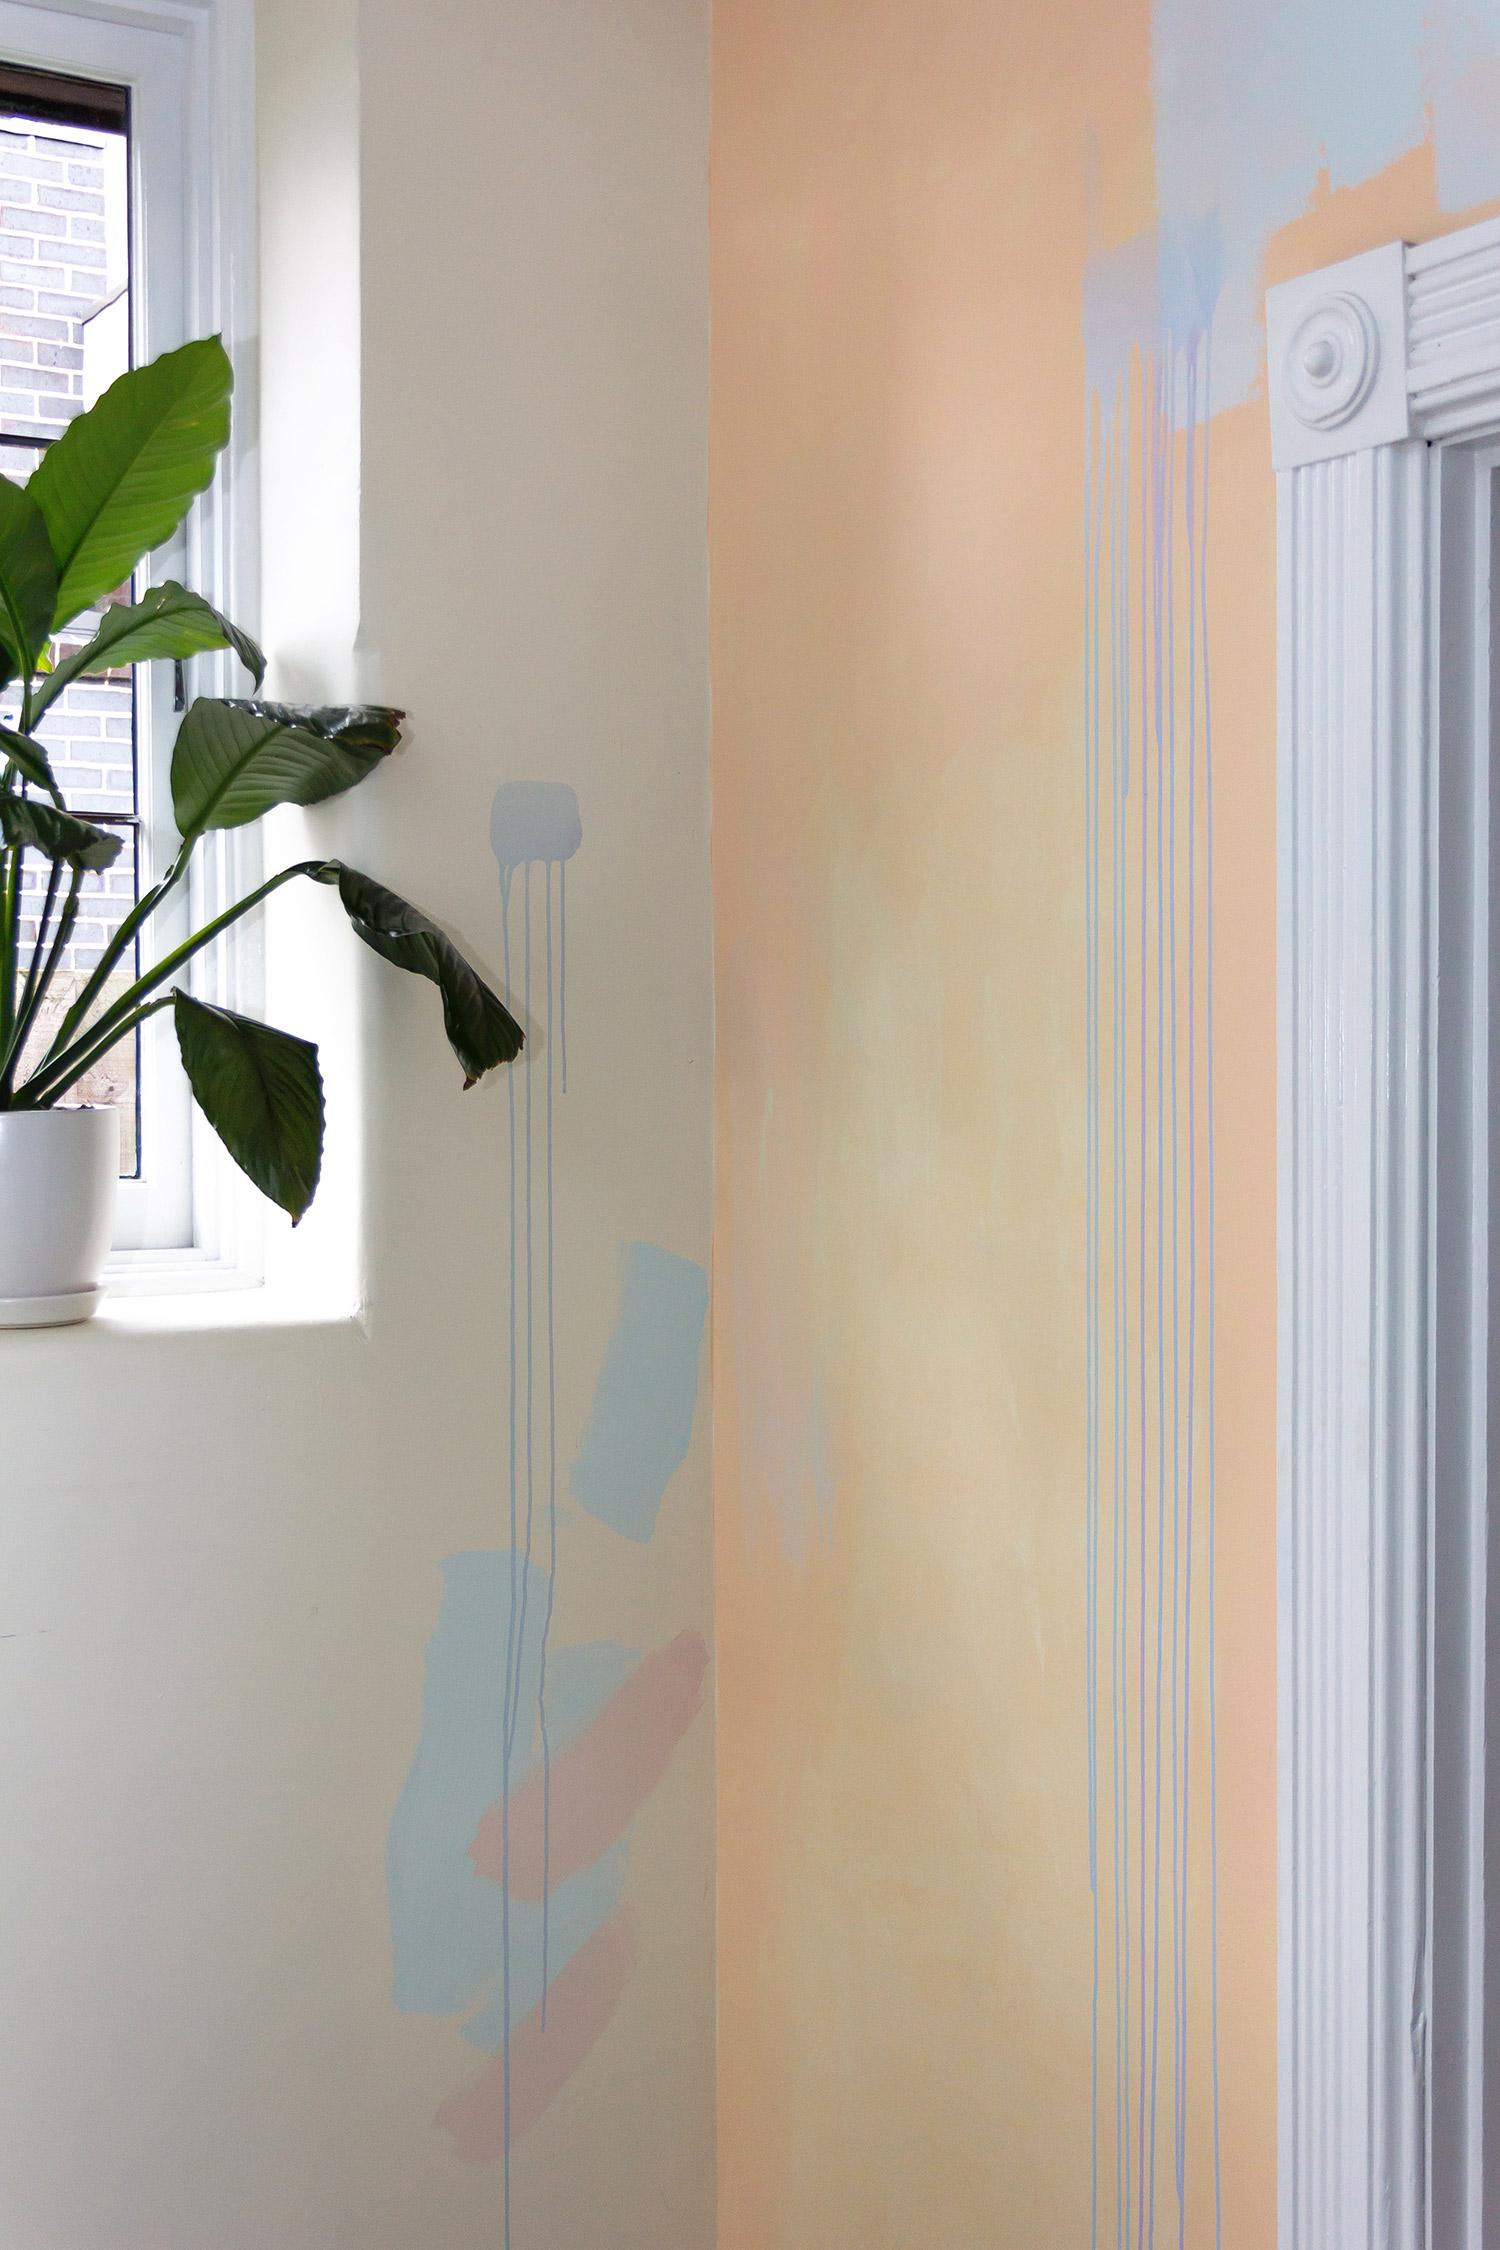 mural-pastel-magical-child-camillejaval-05.jpg